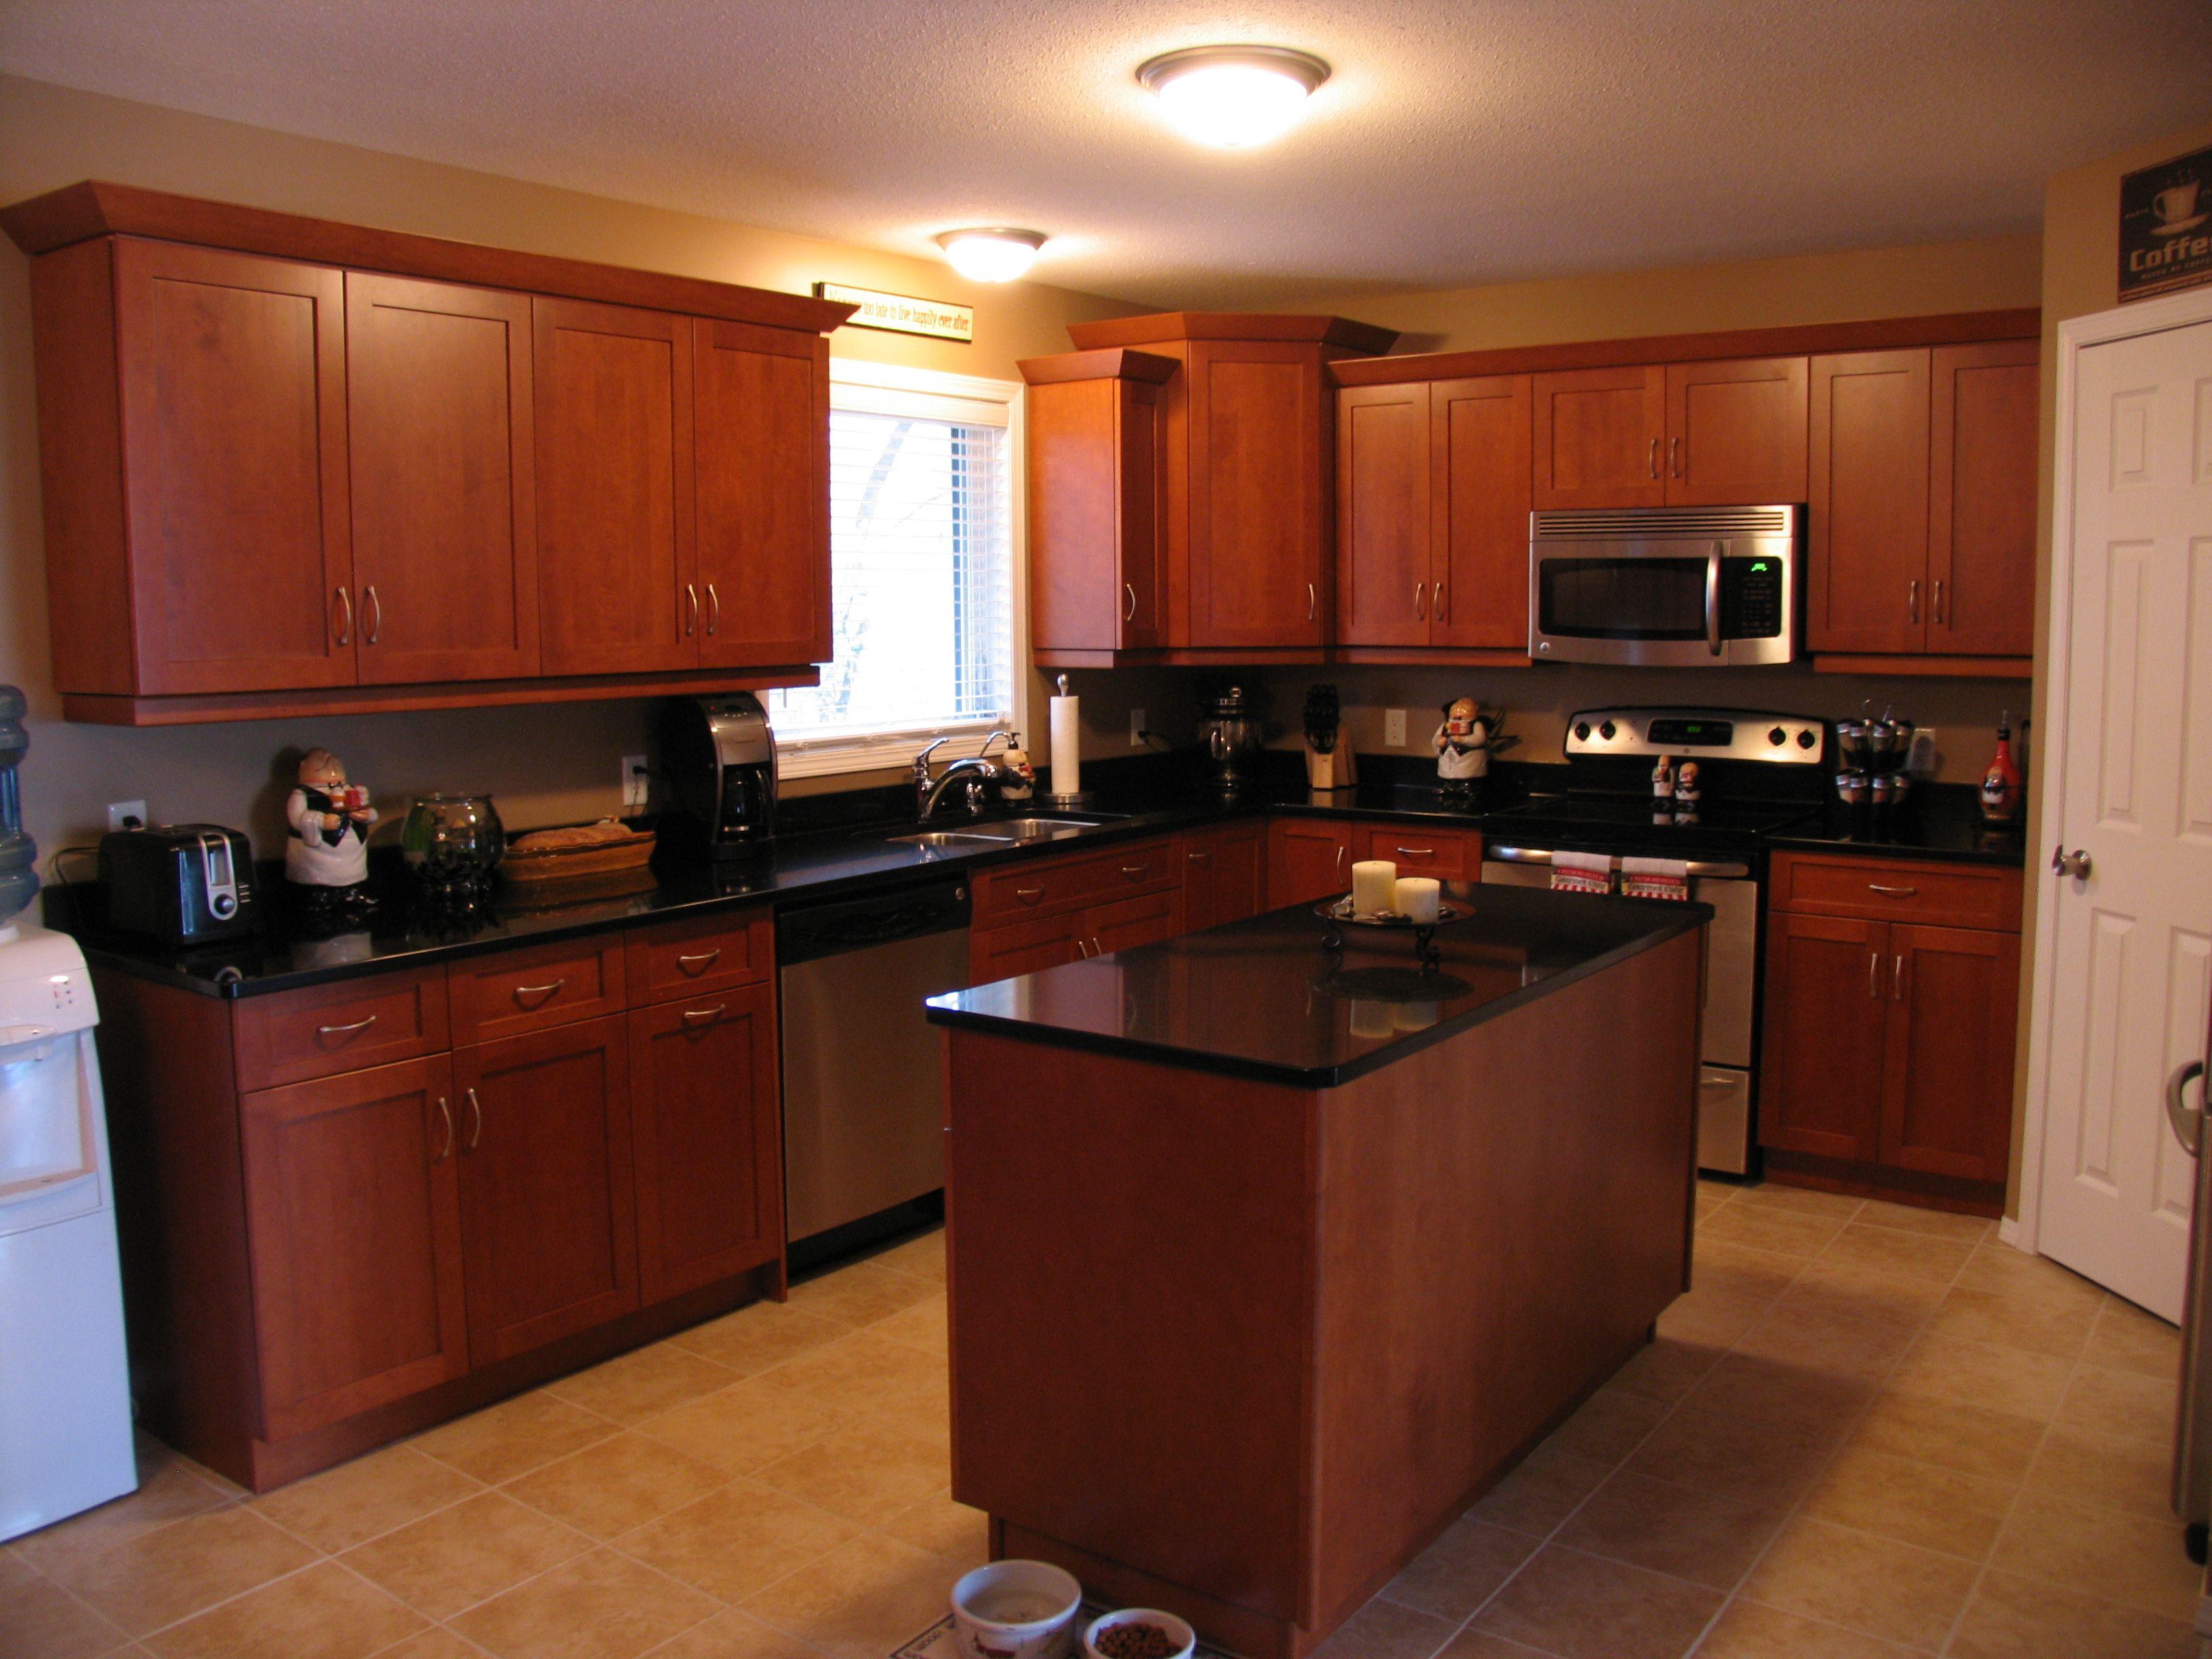 Cabinets: Maple - Honey Maple / Countertop: Cambria Quartz ... on Maple Kitchen Cabinets With Black Countertops  id=64844